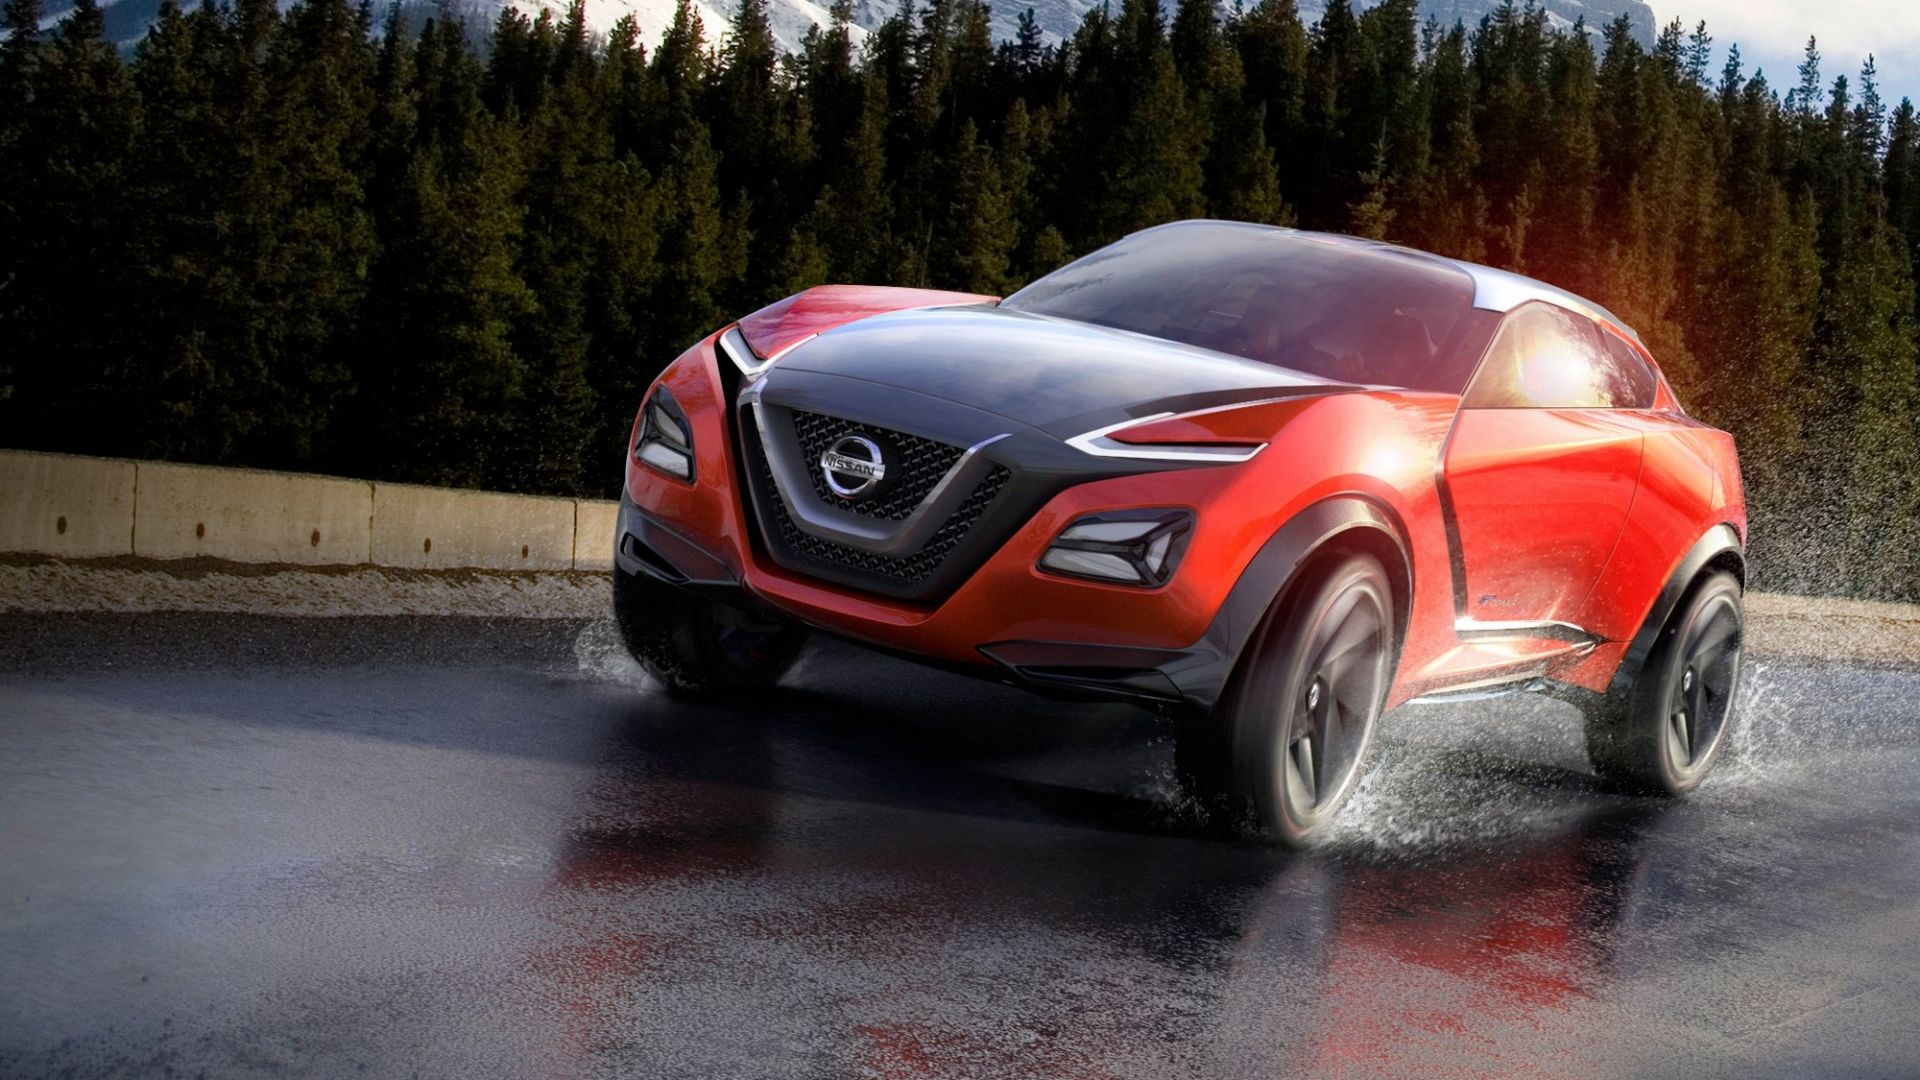 Nissan Qashqai 2019 Ireland | Nissan 2021 Cars